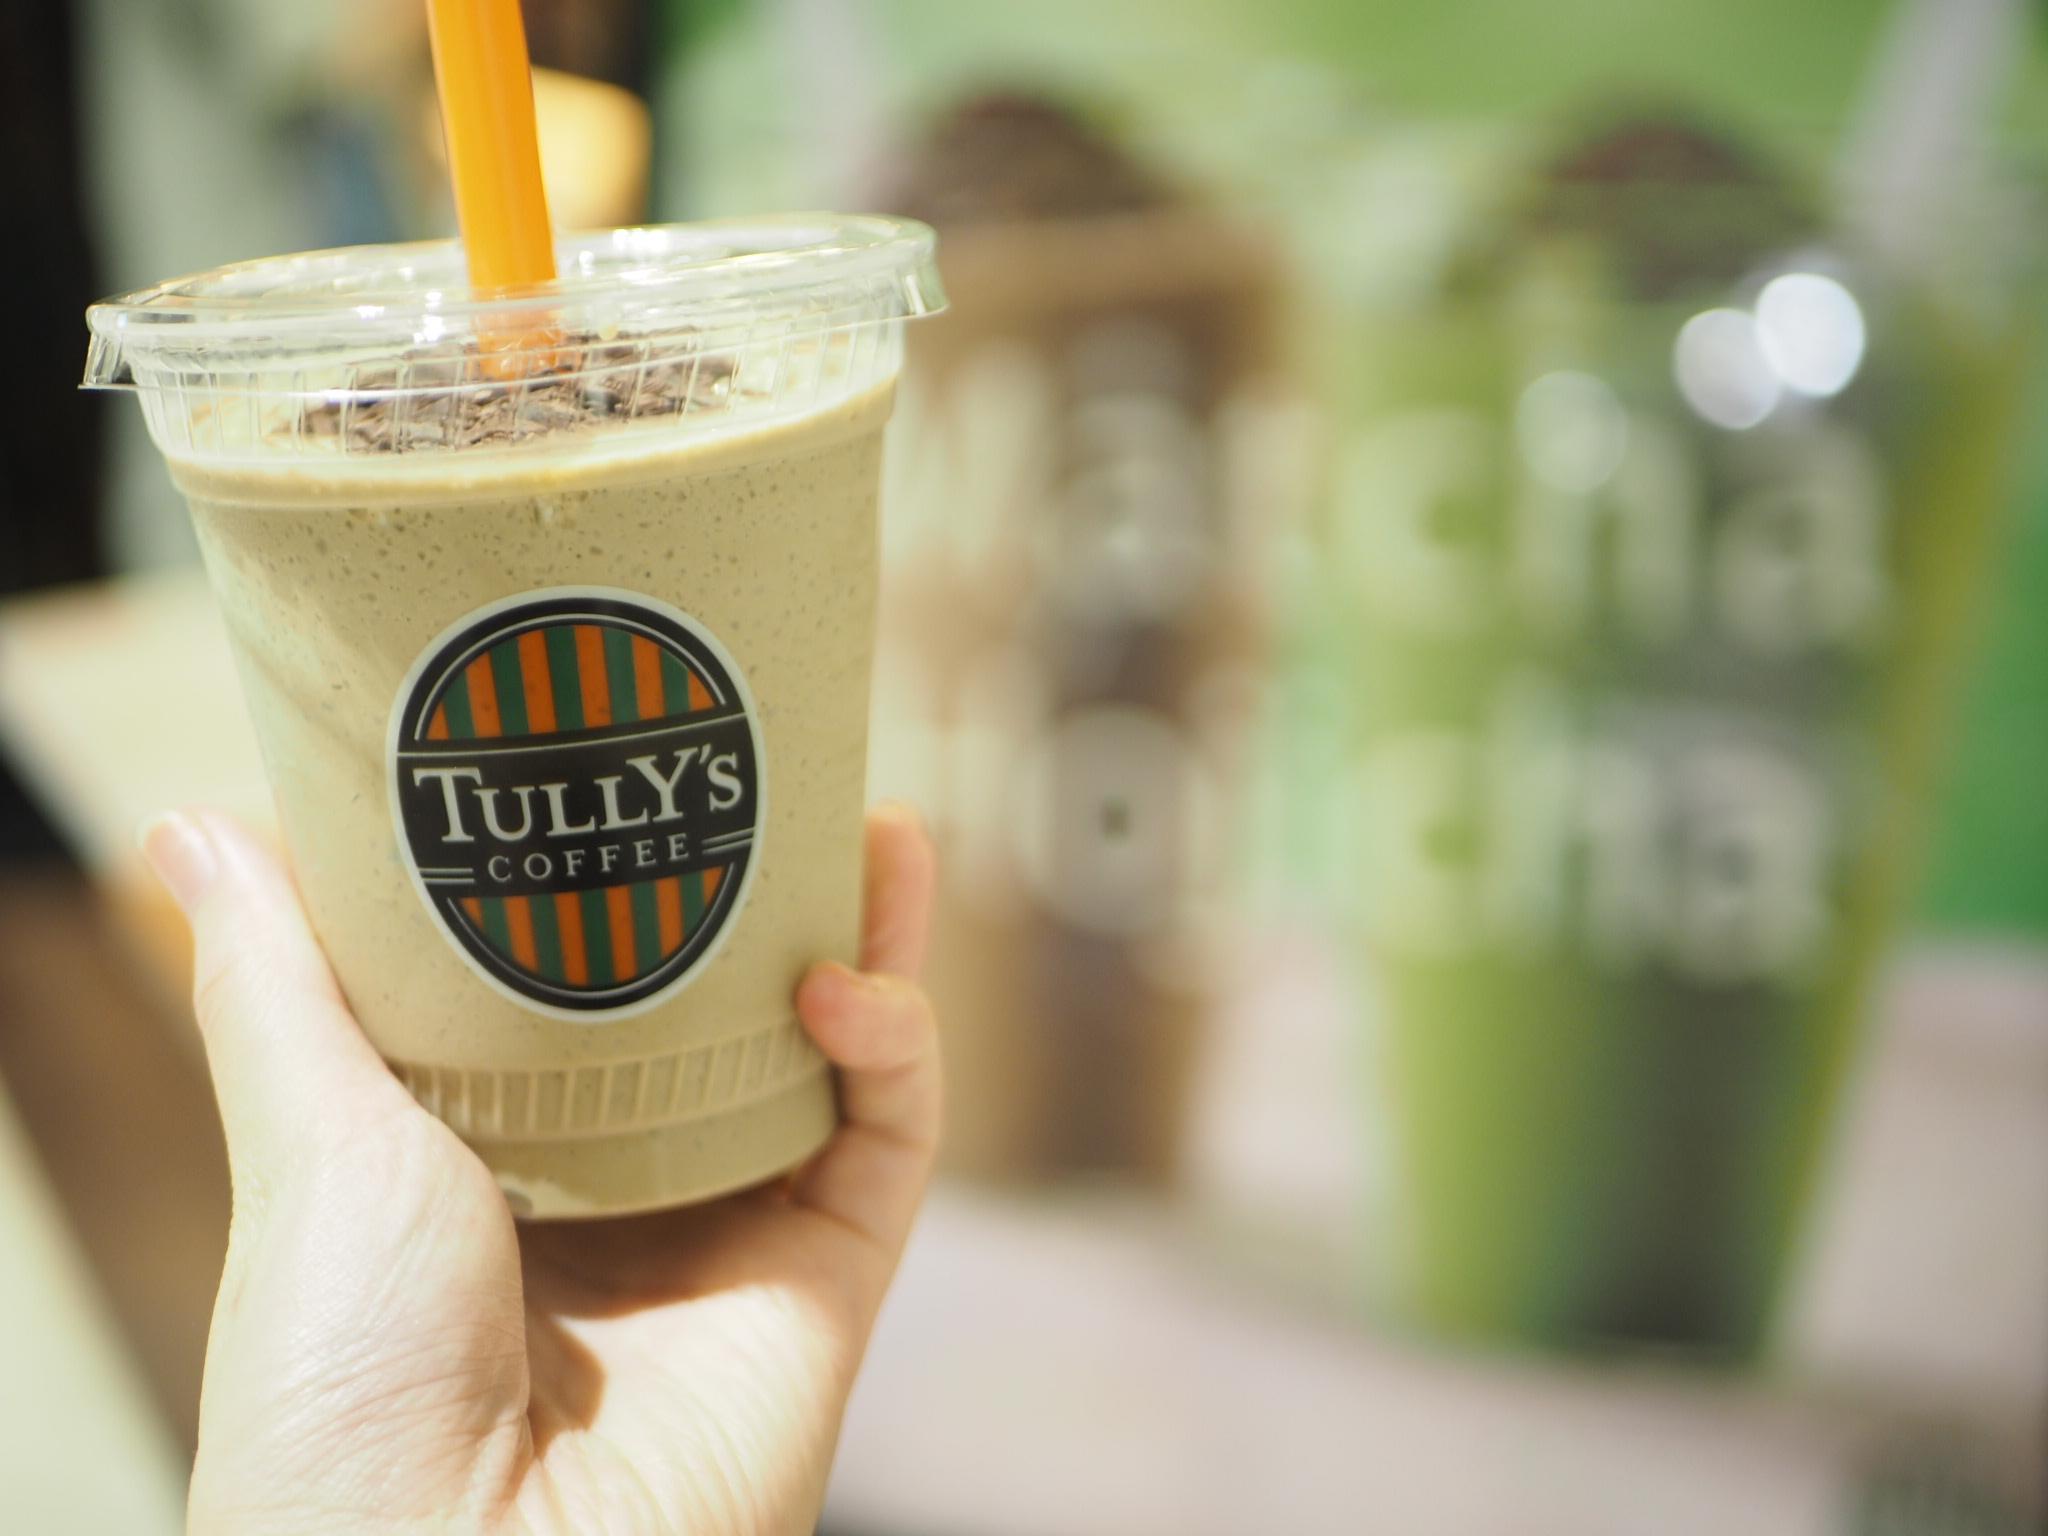 【TULLY'S COFFEE】濃厚フローズンドリンク「抹茶リスタ」&「ほうじ茶リスタ」が待望のレギュラーメニューに❤︎_2